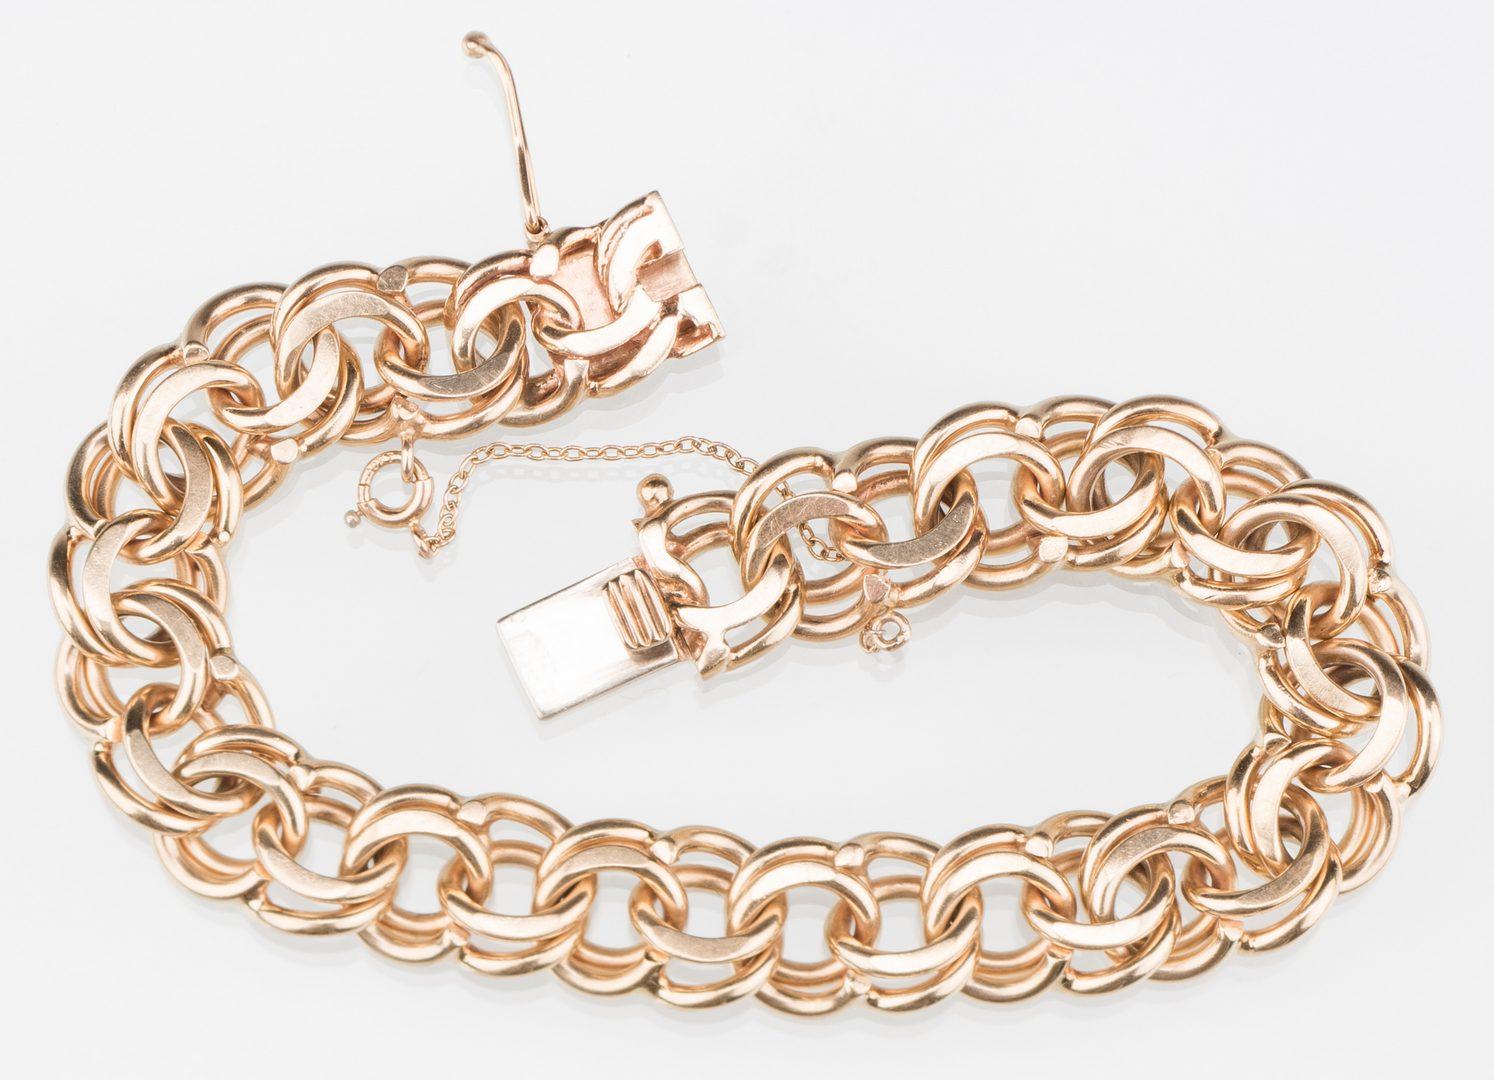 Lot 247: 14K link bracelet, 39.4 grams